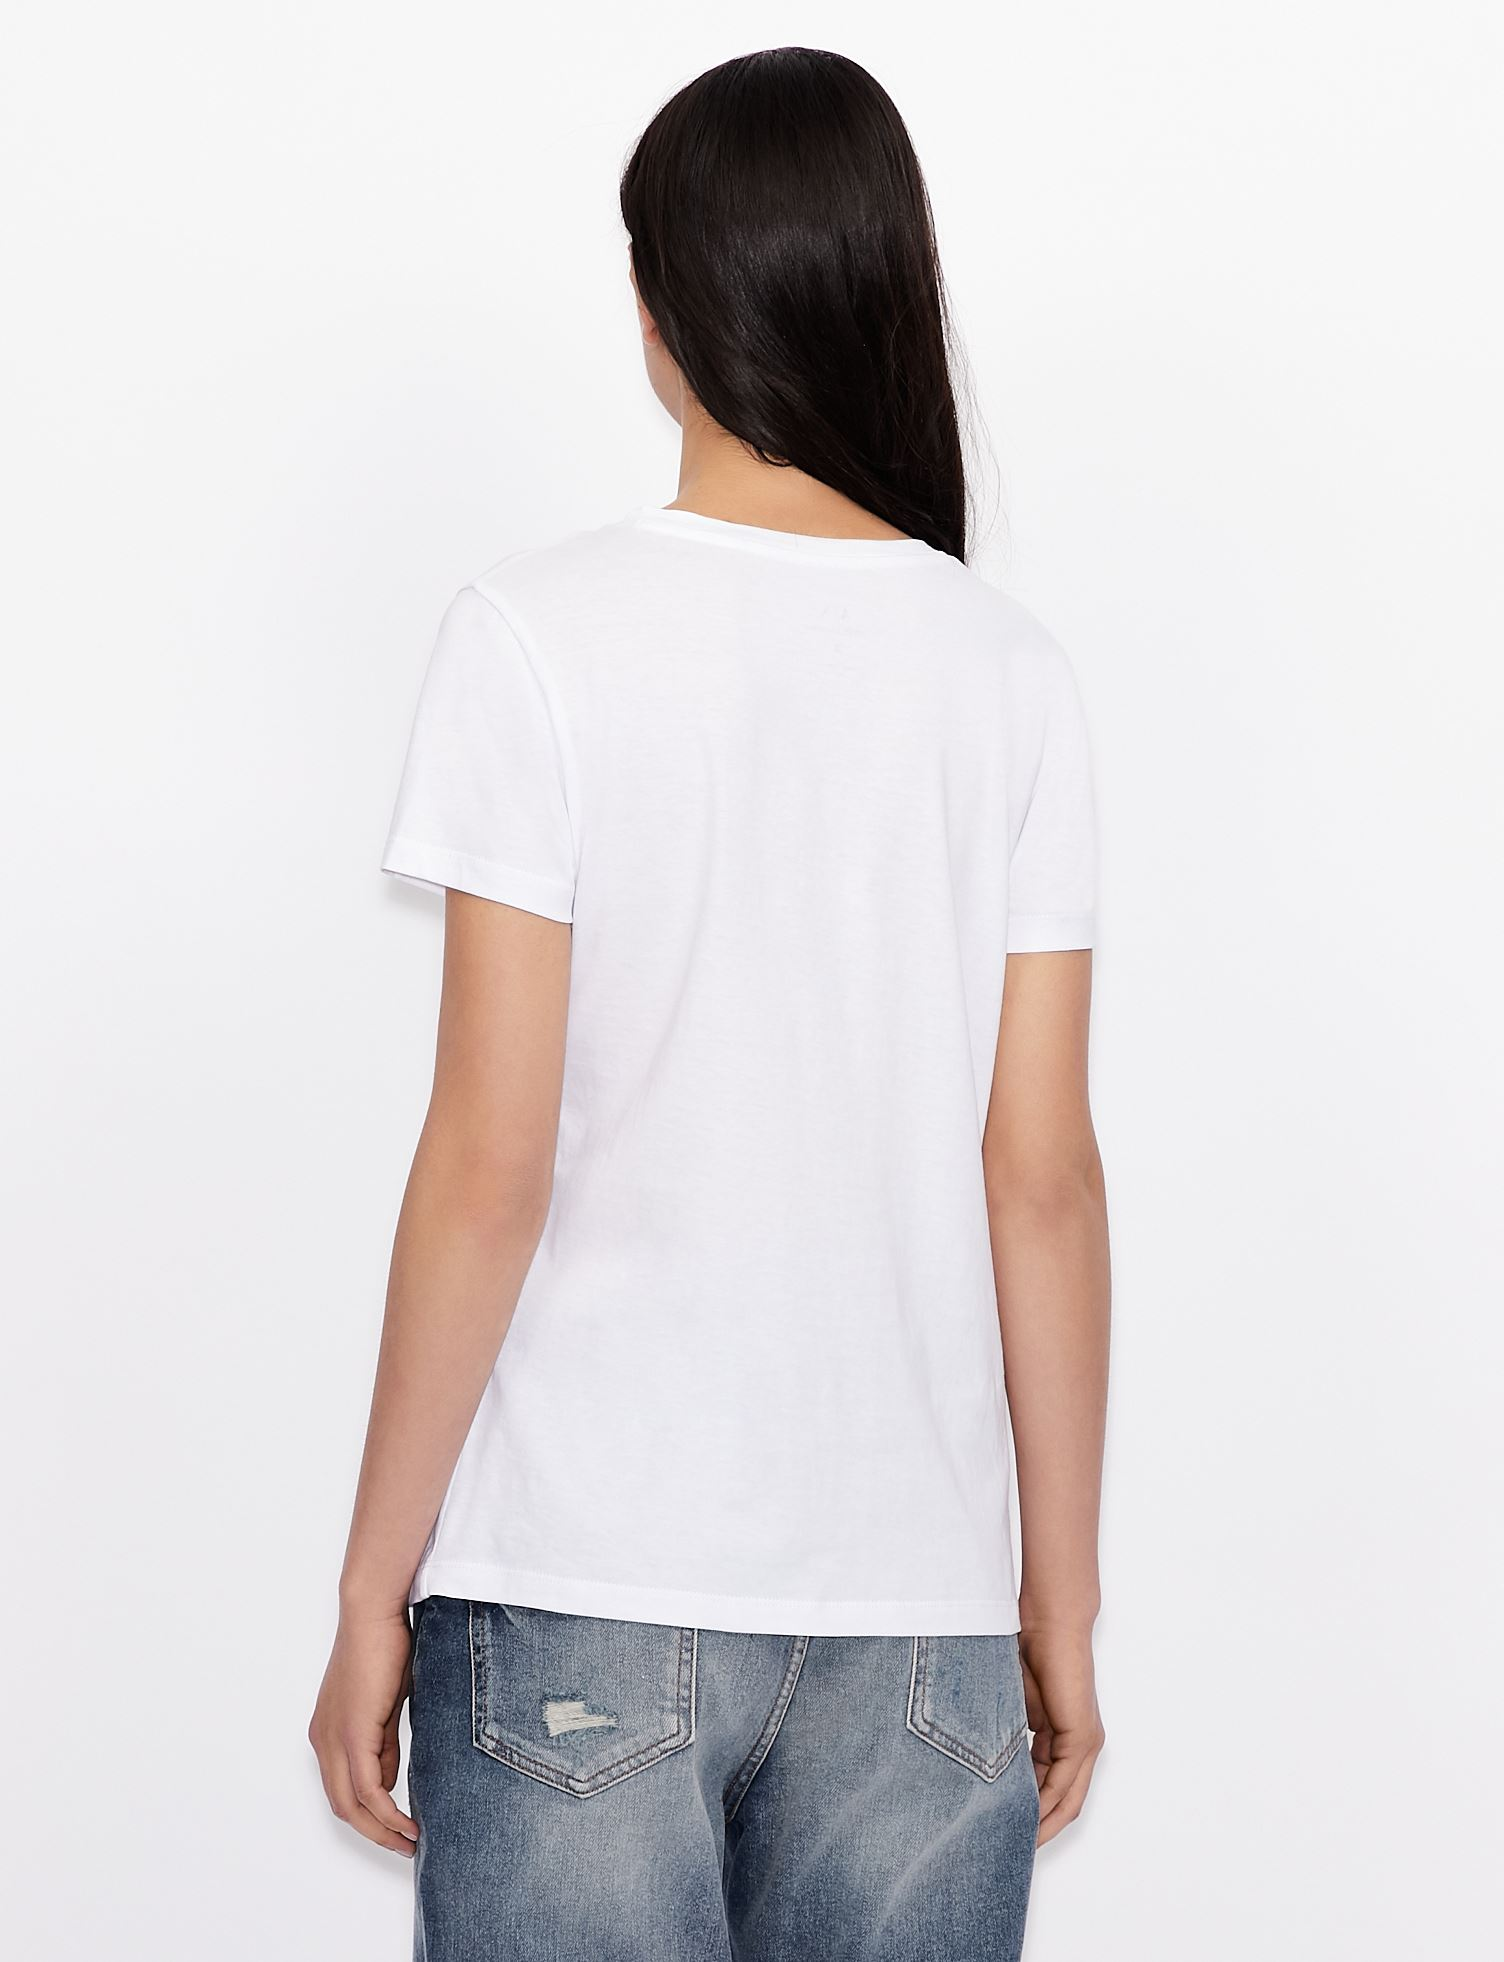 T-shirt con stampa Armani Exchange ARMANI EXCHANGE | T-shirt | 3KYTKE-YJW3Z9152